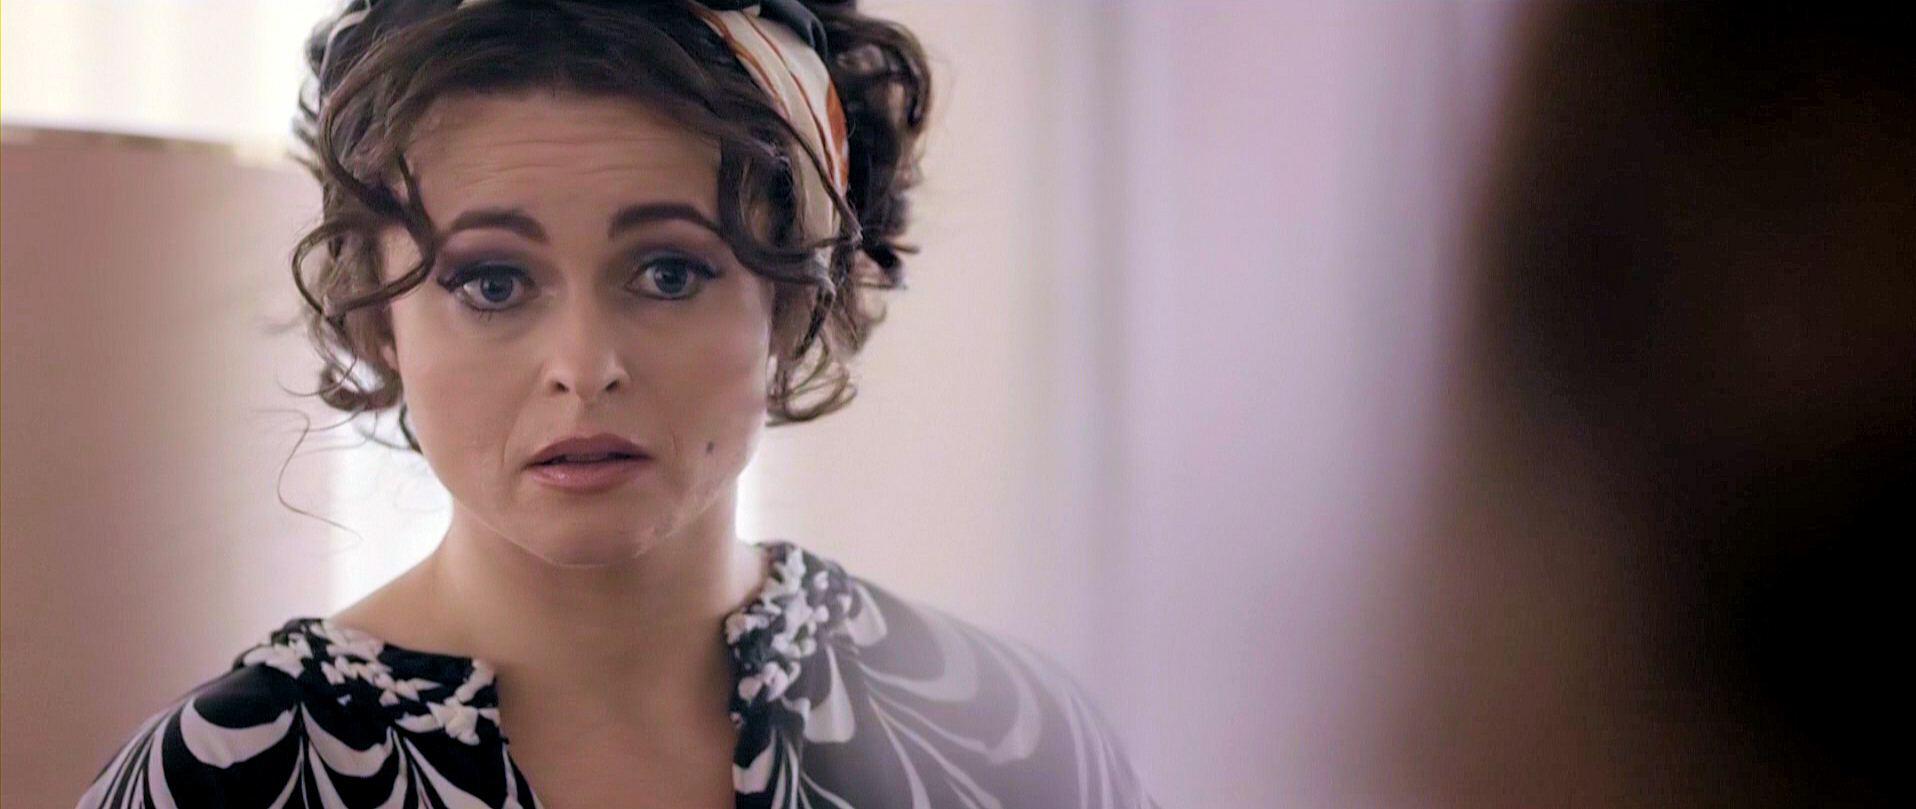 Screenshot from Burton and Taylor (2013) (2) featuring Helena Bonham Carter